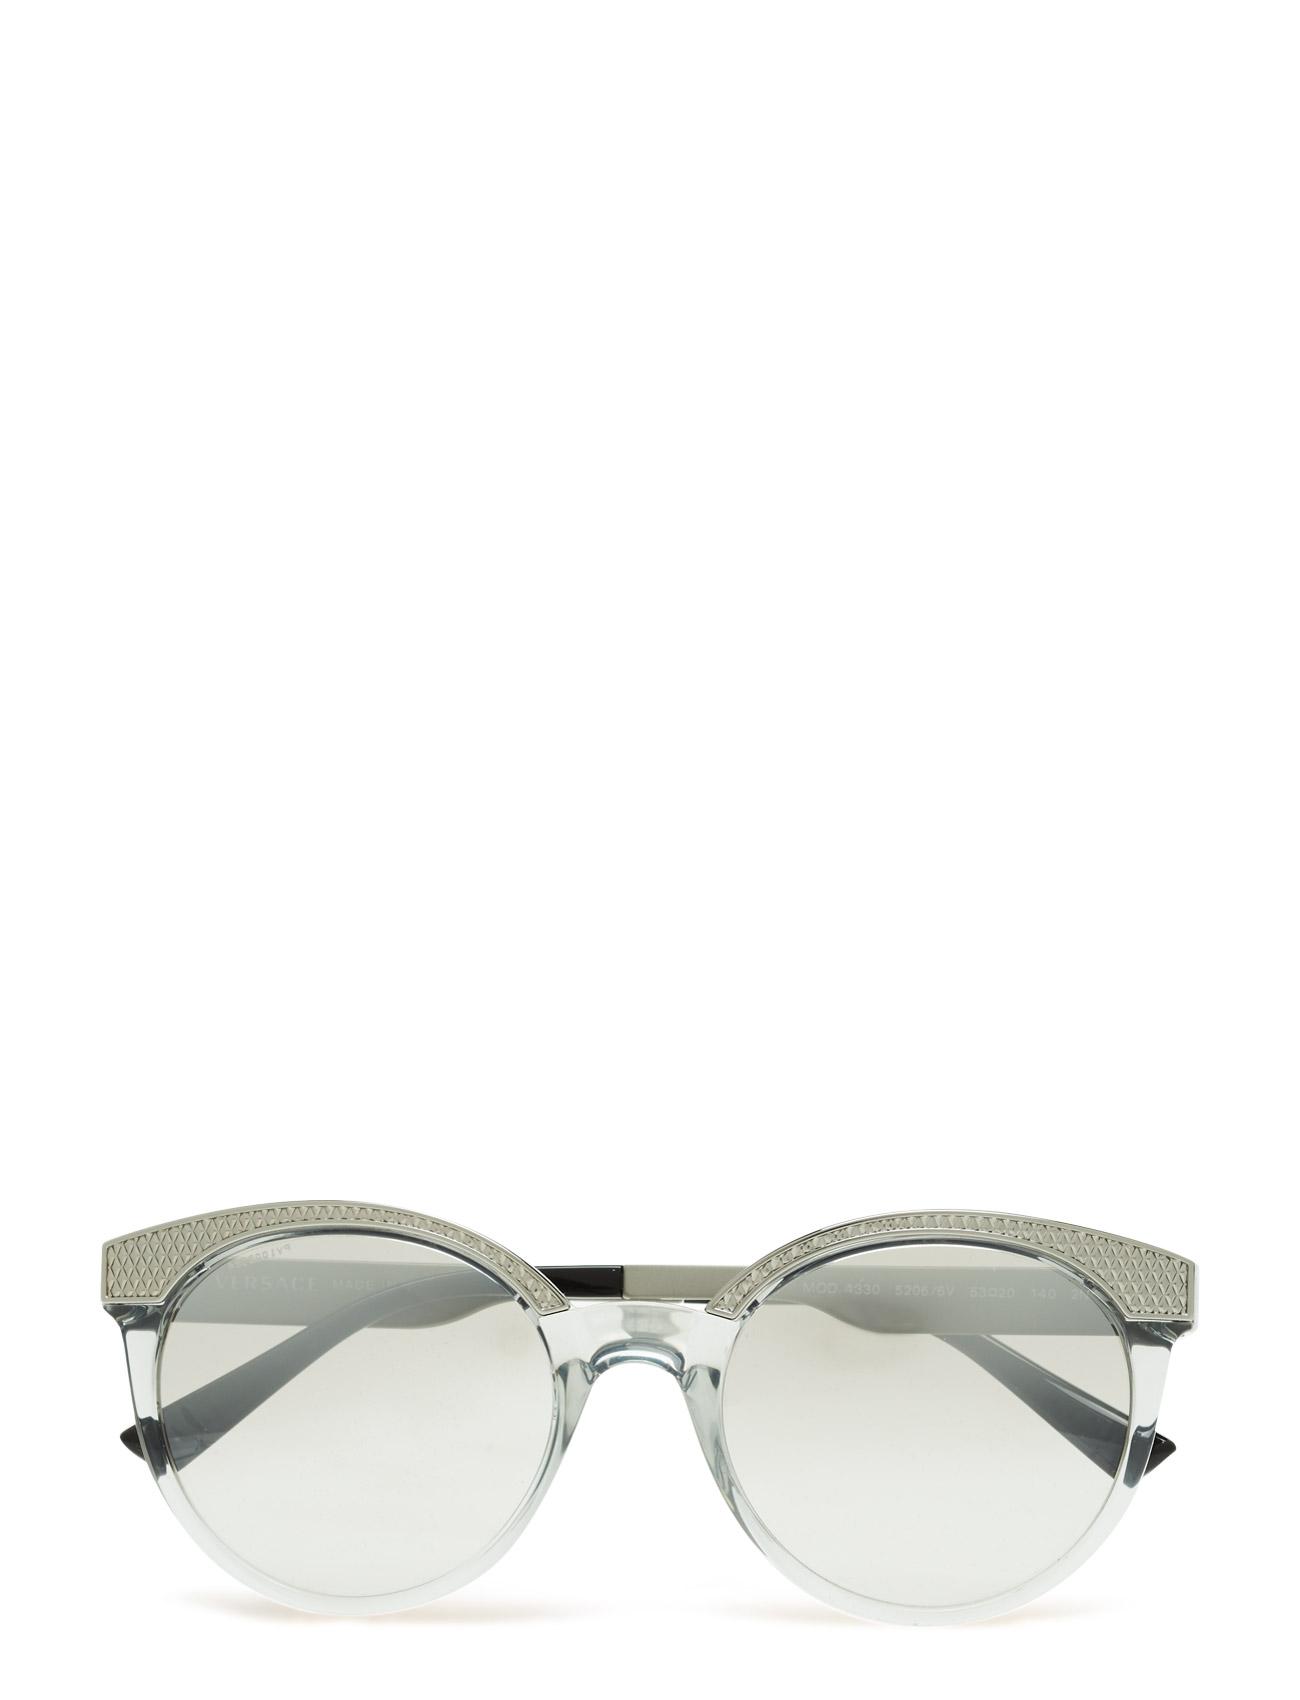 versace sunglasses – Rock icons | studs medusa fra boozt.com dk